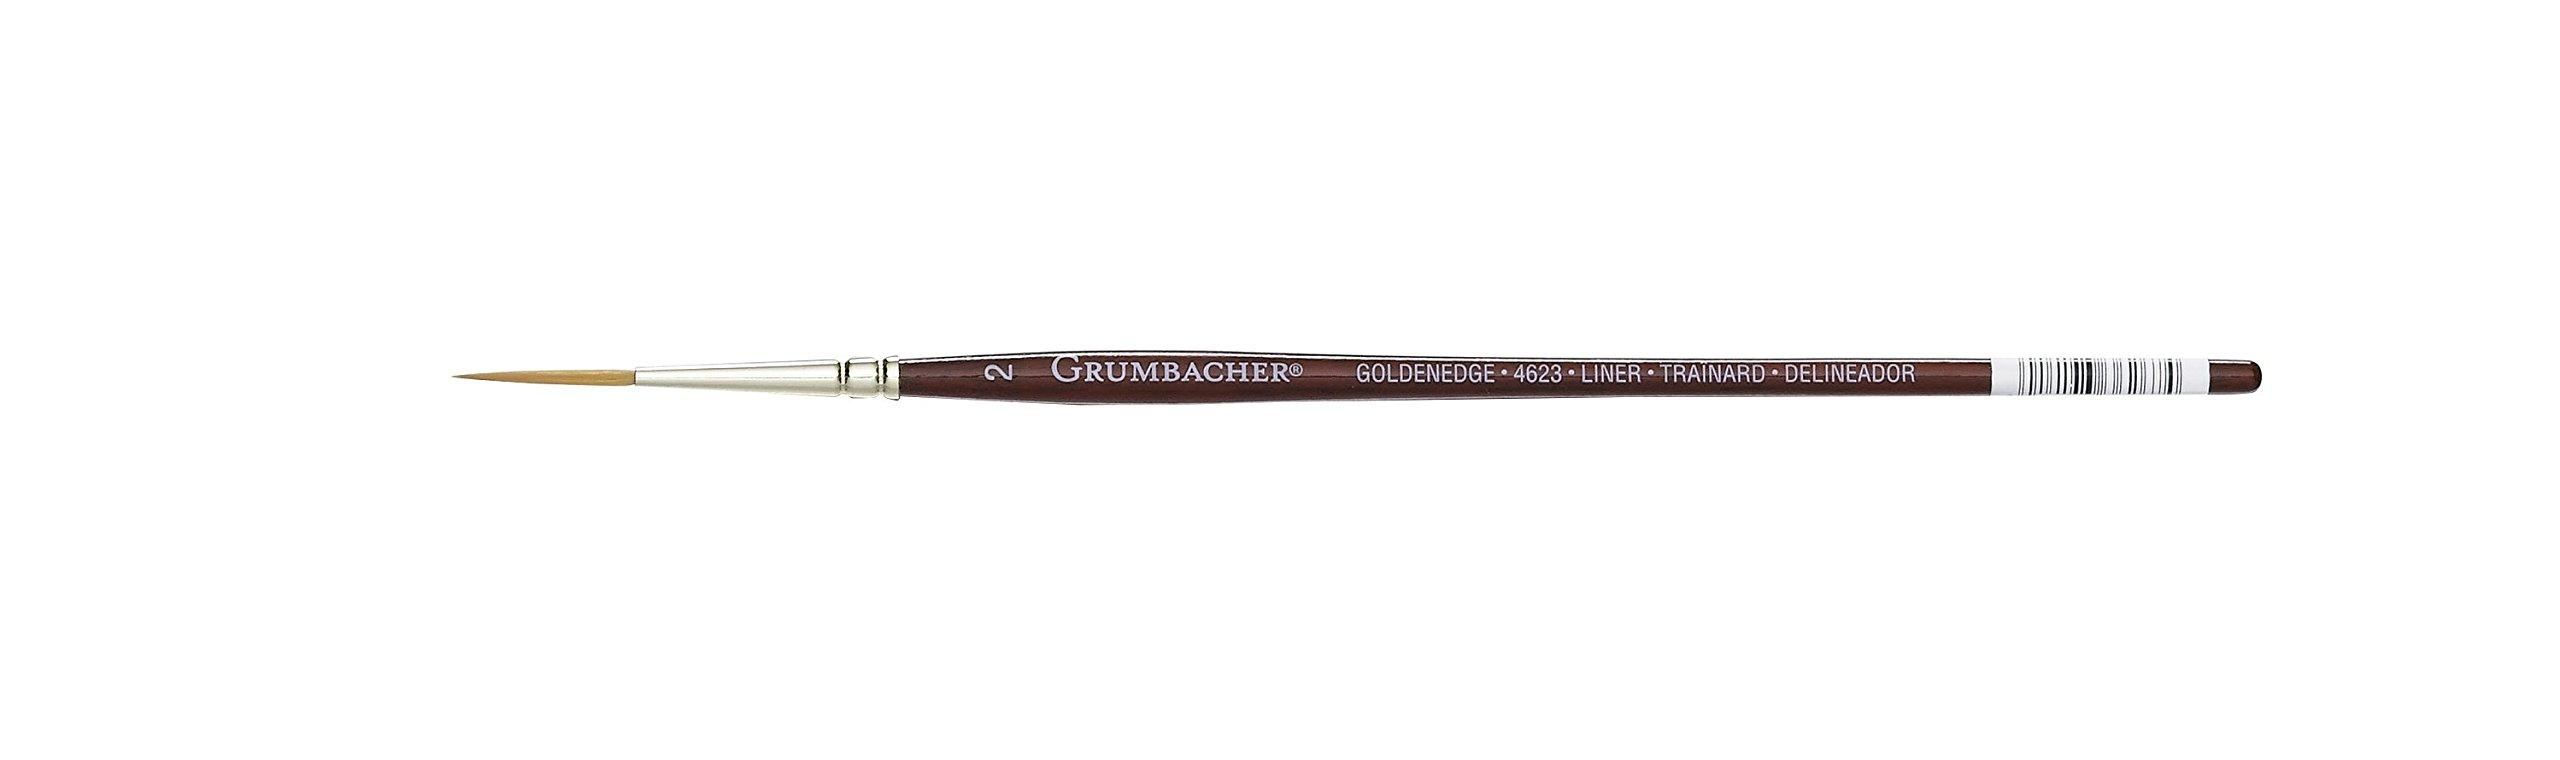 Grumbacher Goldenedge Golden Toray Liner Watercolor Brush, Synthetic Bristles, Size 2 (4623.2) by GRUMBACHER